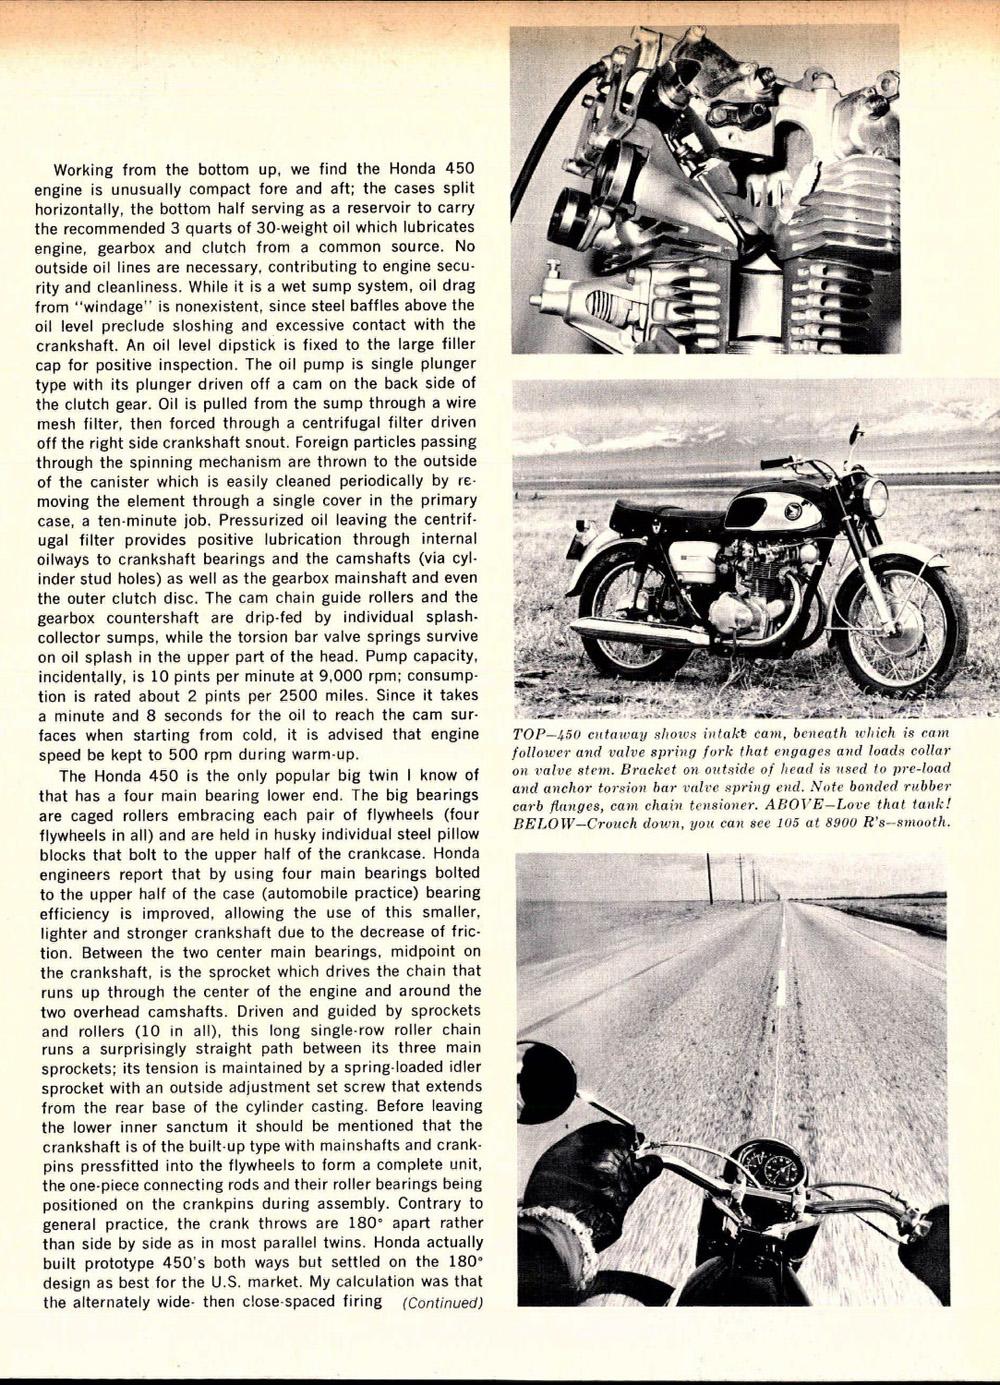 Honda 450 Engine tech article 03.jpg